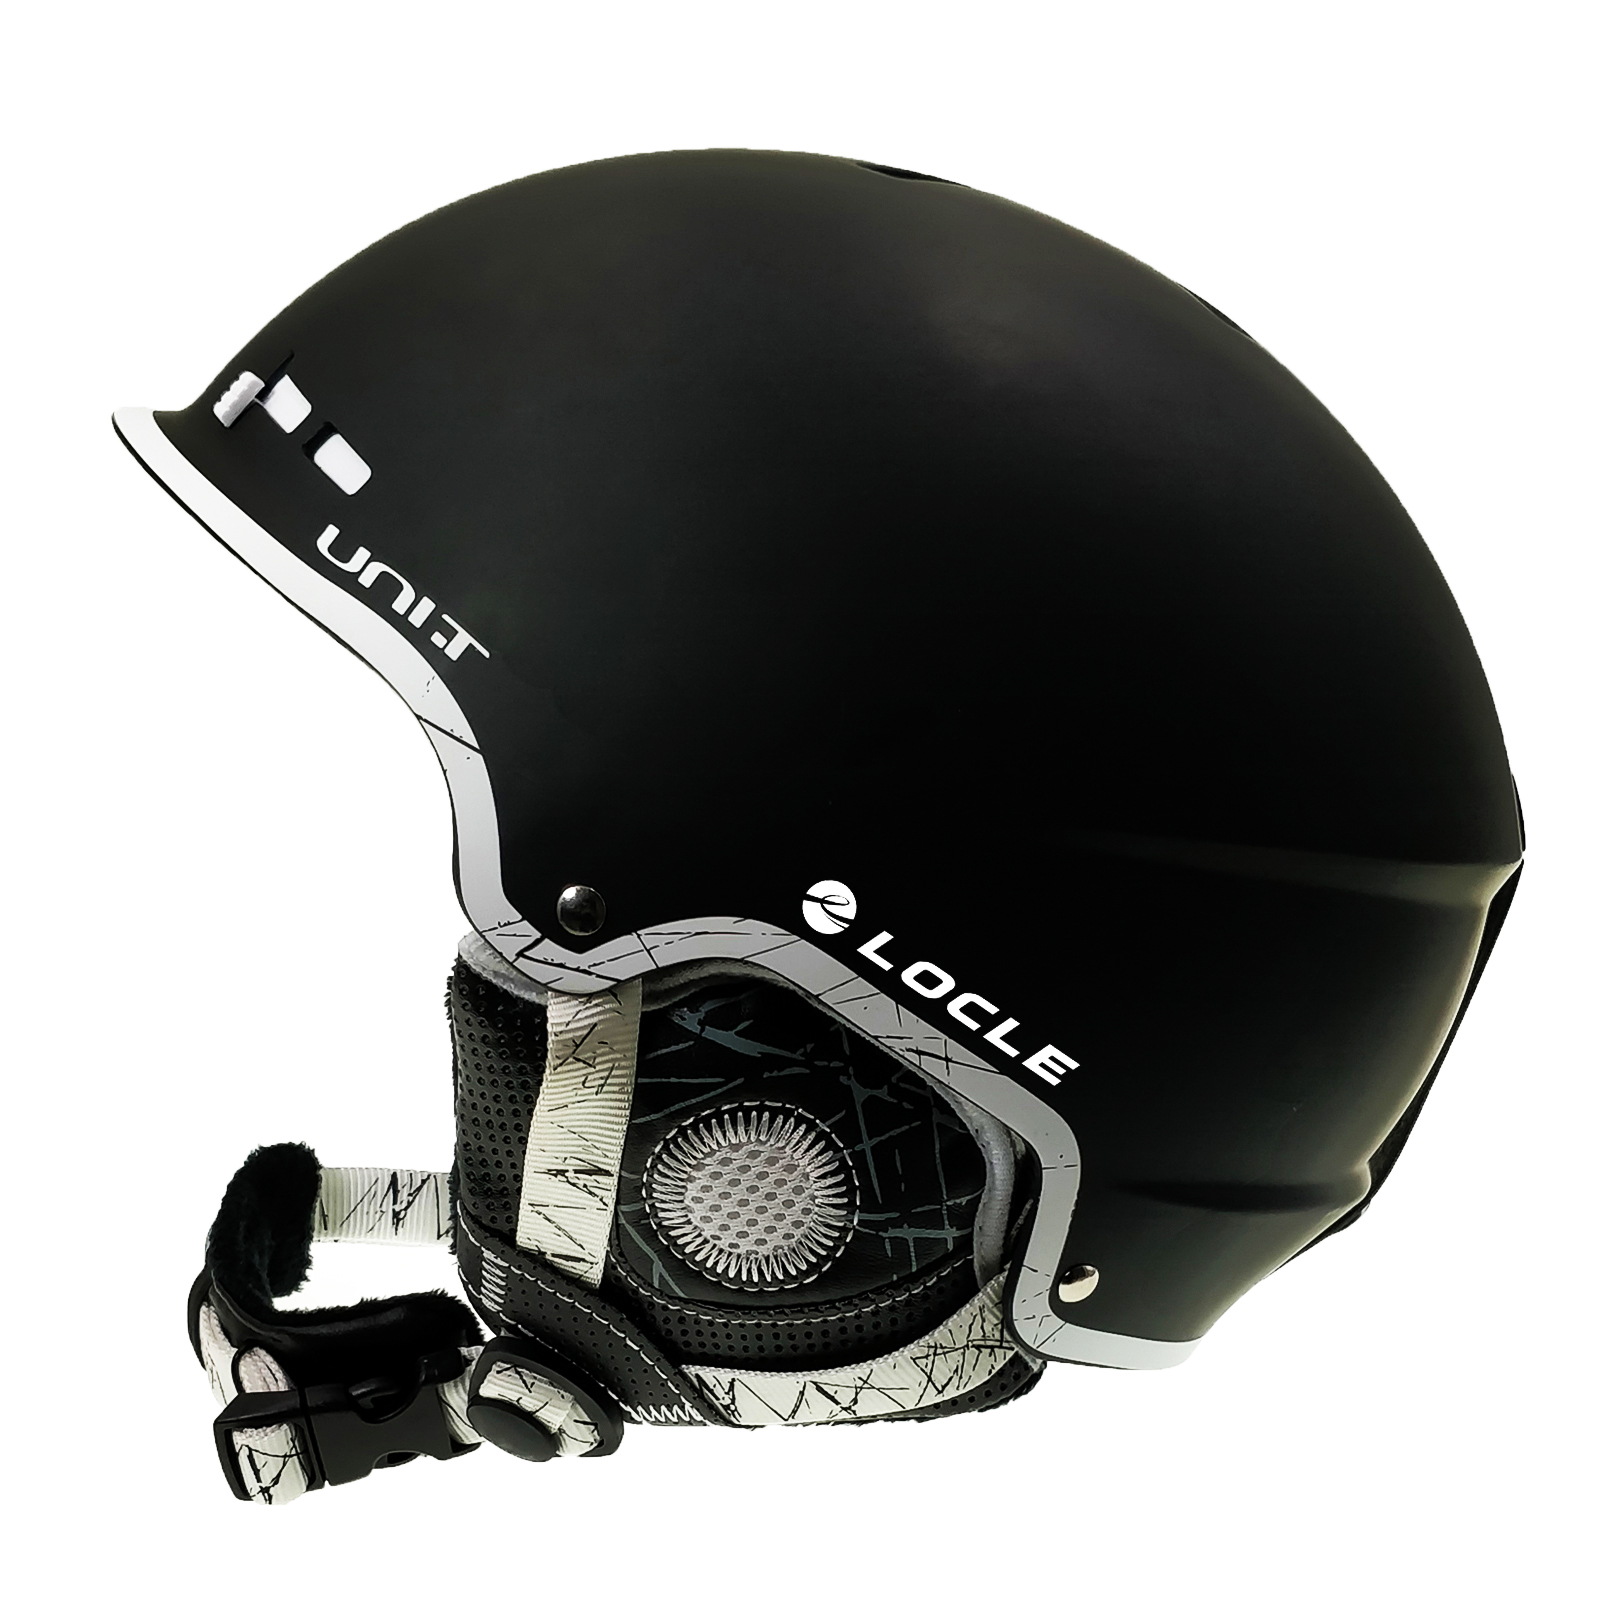 LOCLE Professional Ski Helmet CE Certification Safety Skiing Helmet Skating Skateboard Helmet Ski Snowboard Helmet 56